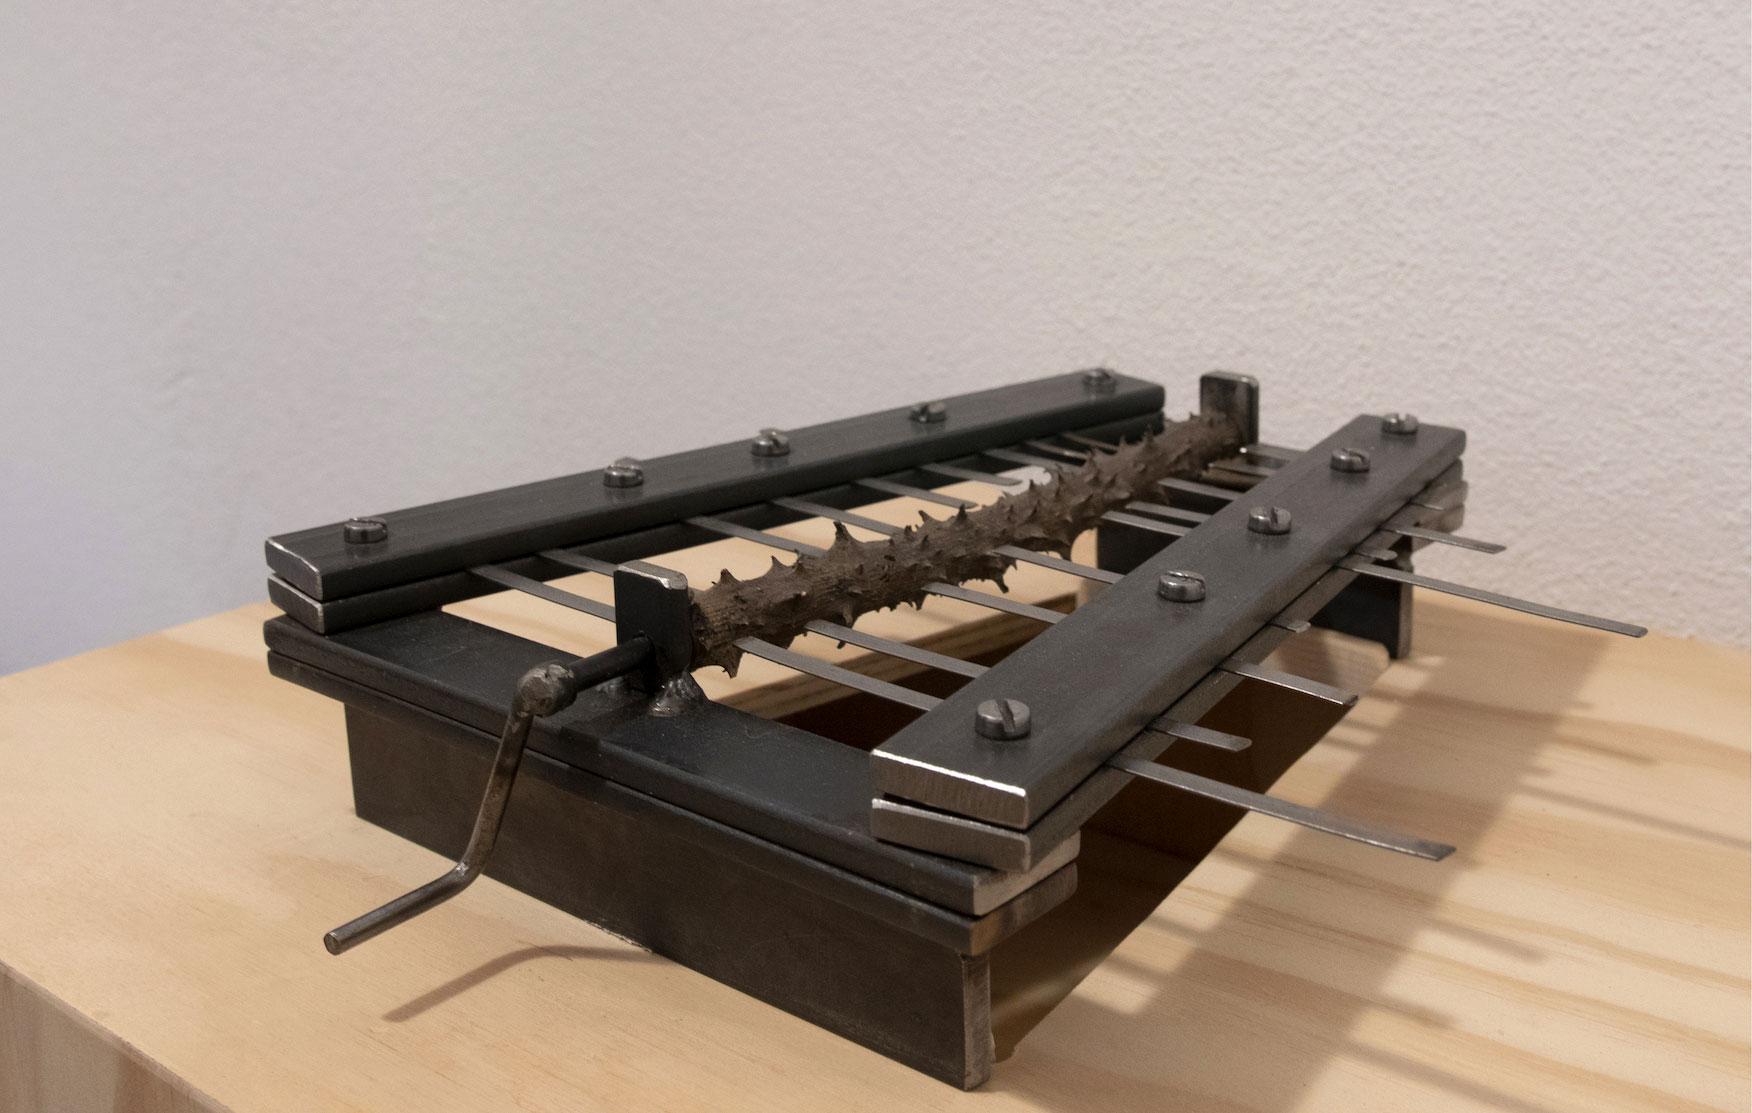 Rhodon Rheon, 2013, ferro, acciaio armonico, bronzo, legno, cm 25x27x5